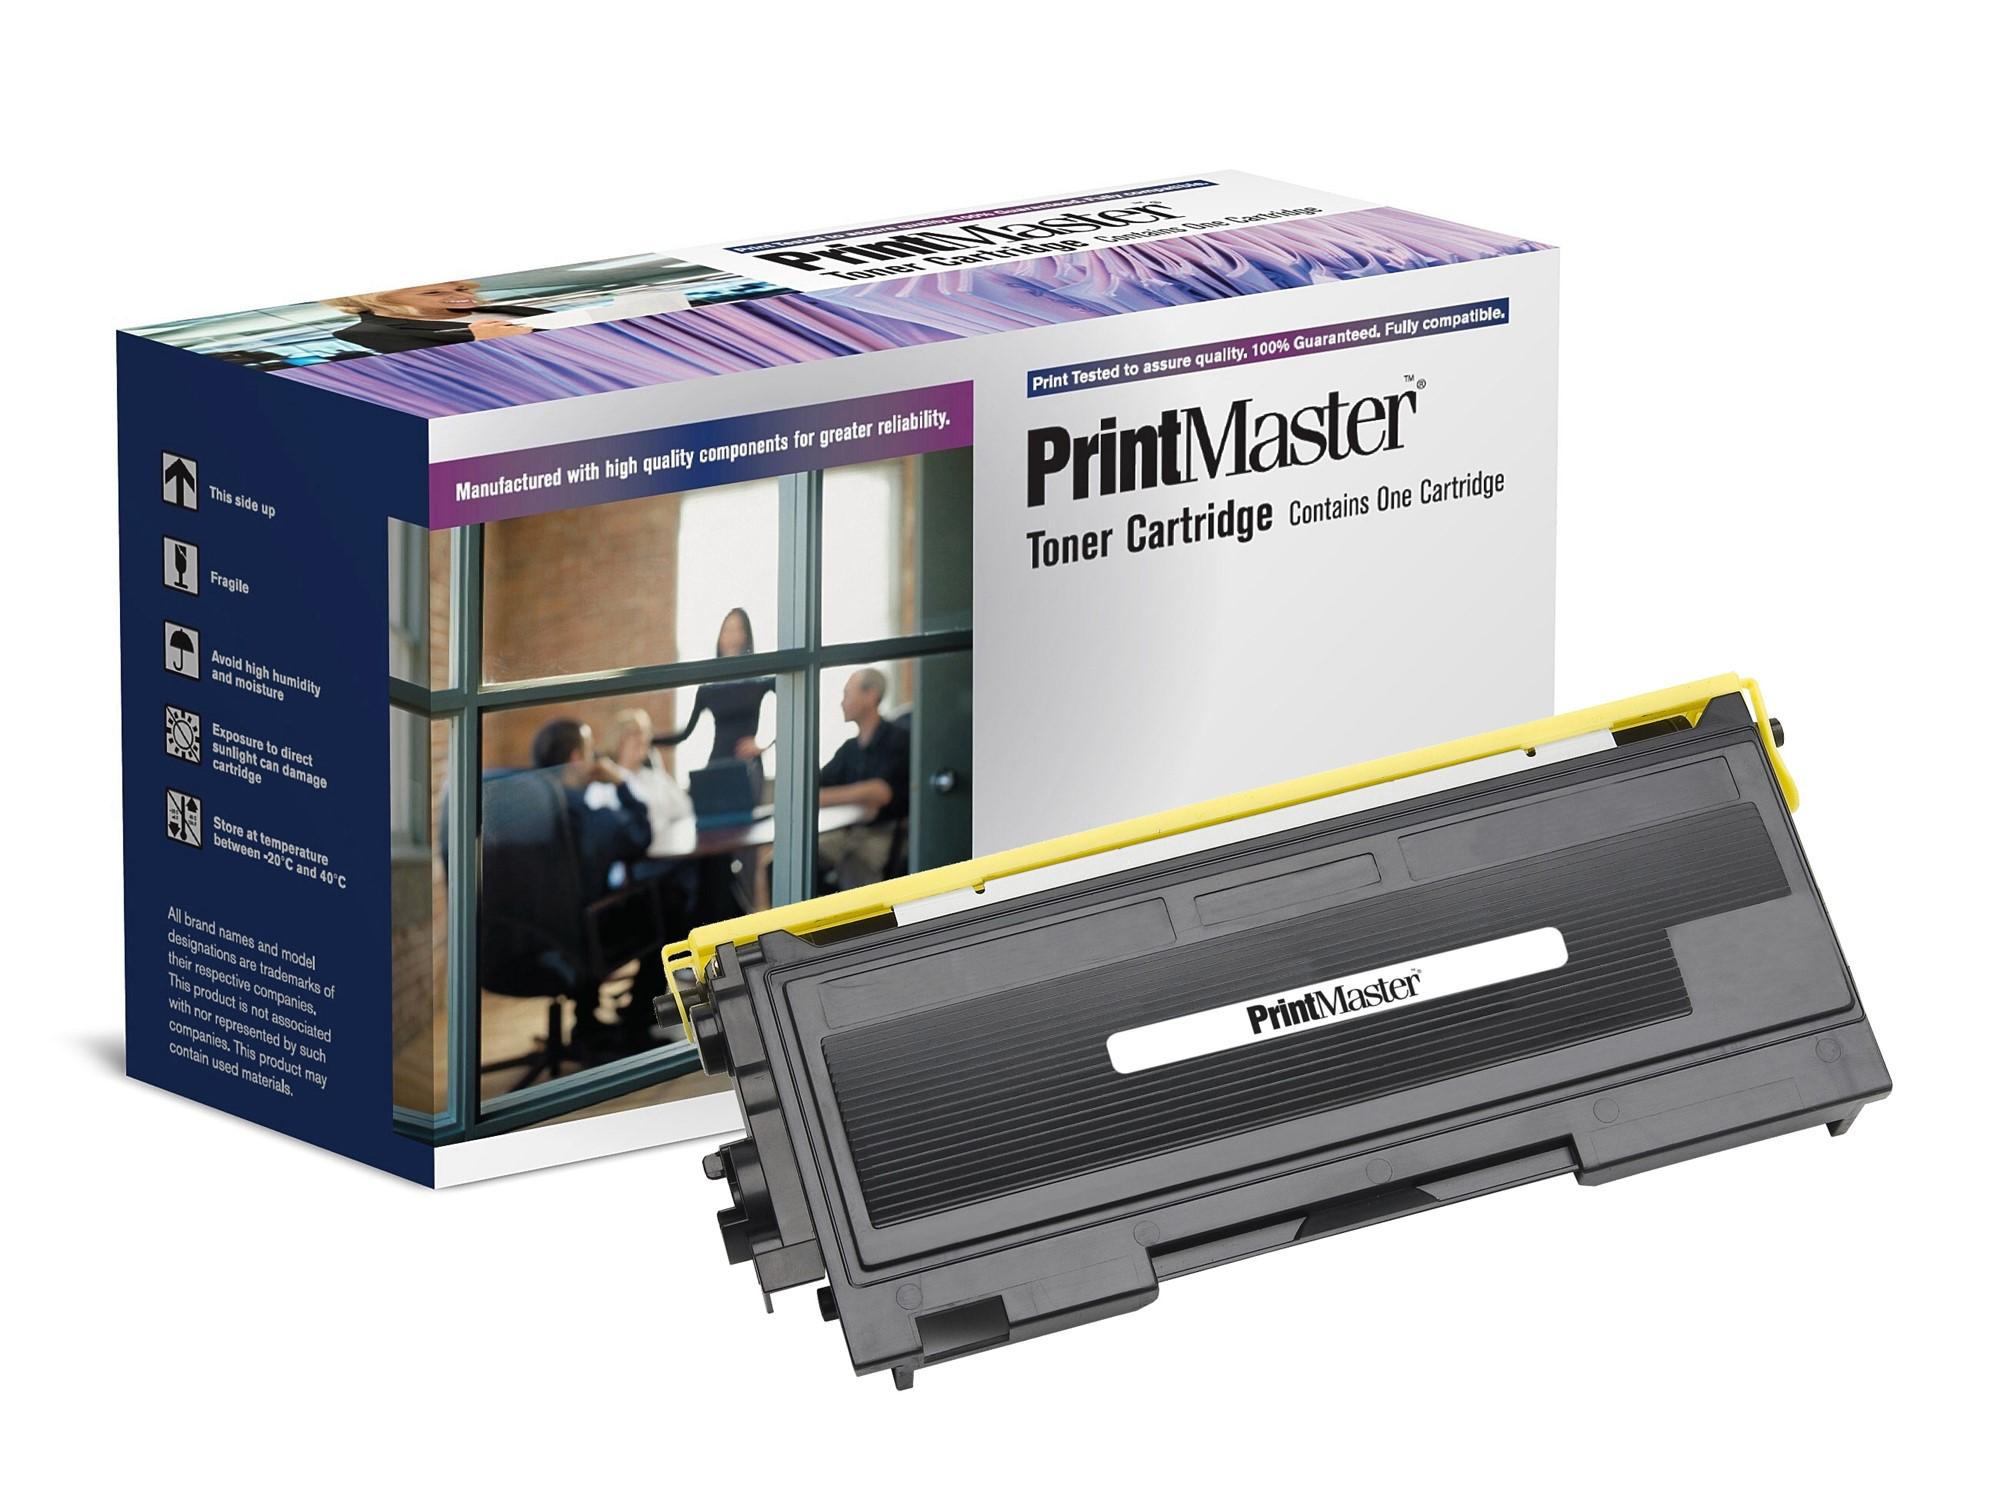 PrintMaster Brother HL2030/40 TN2000